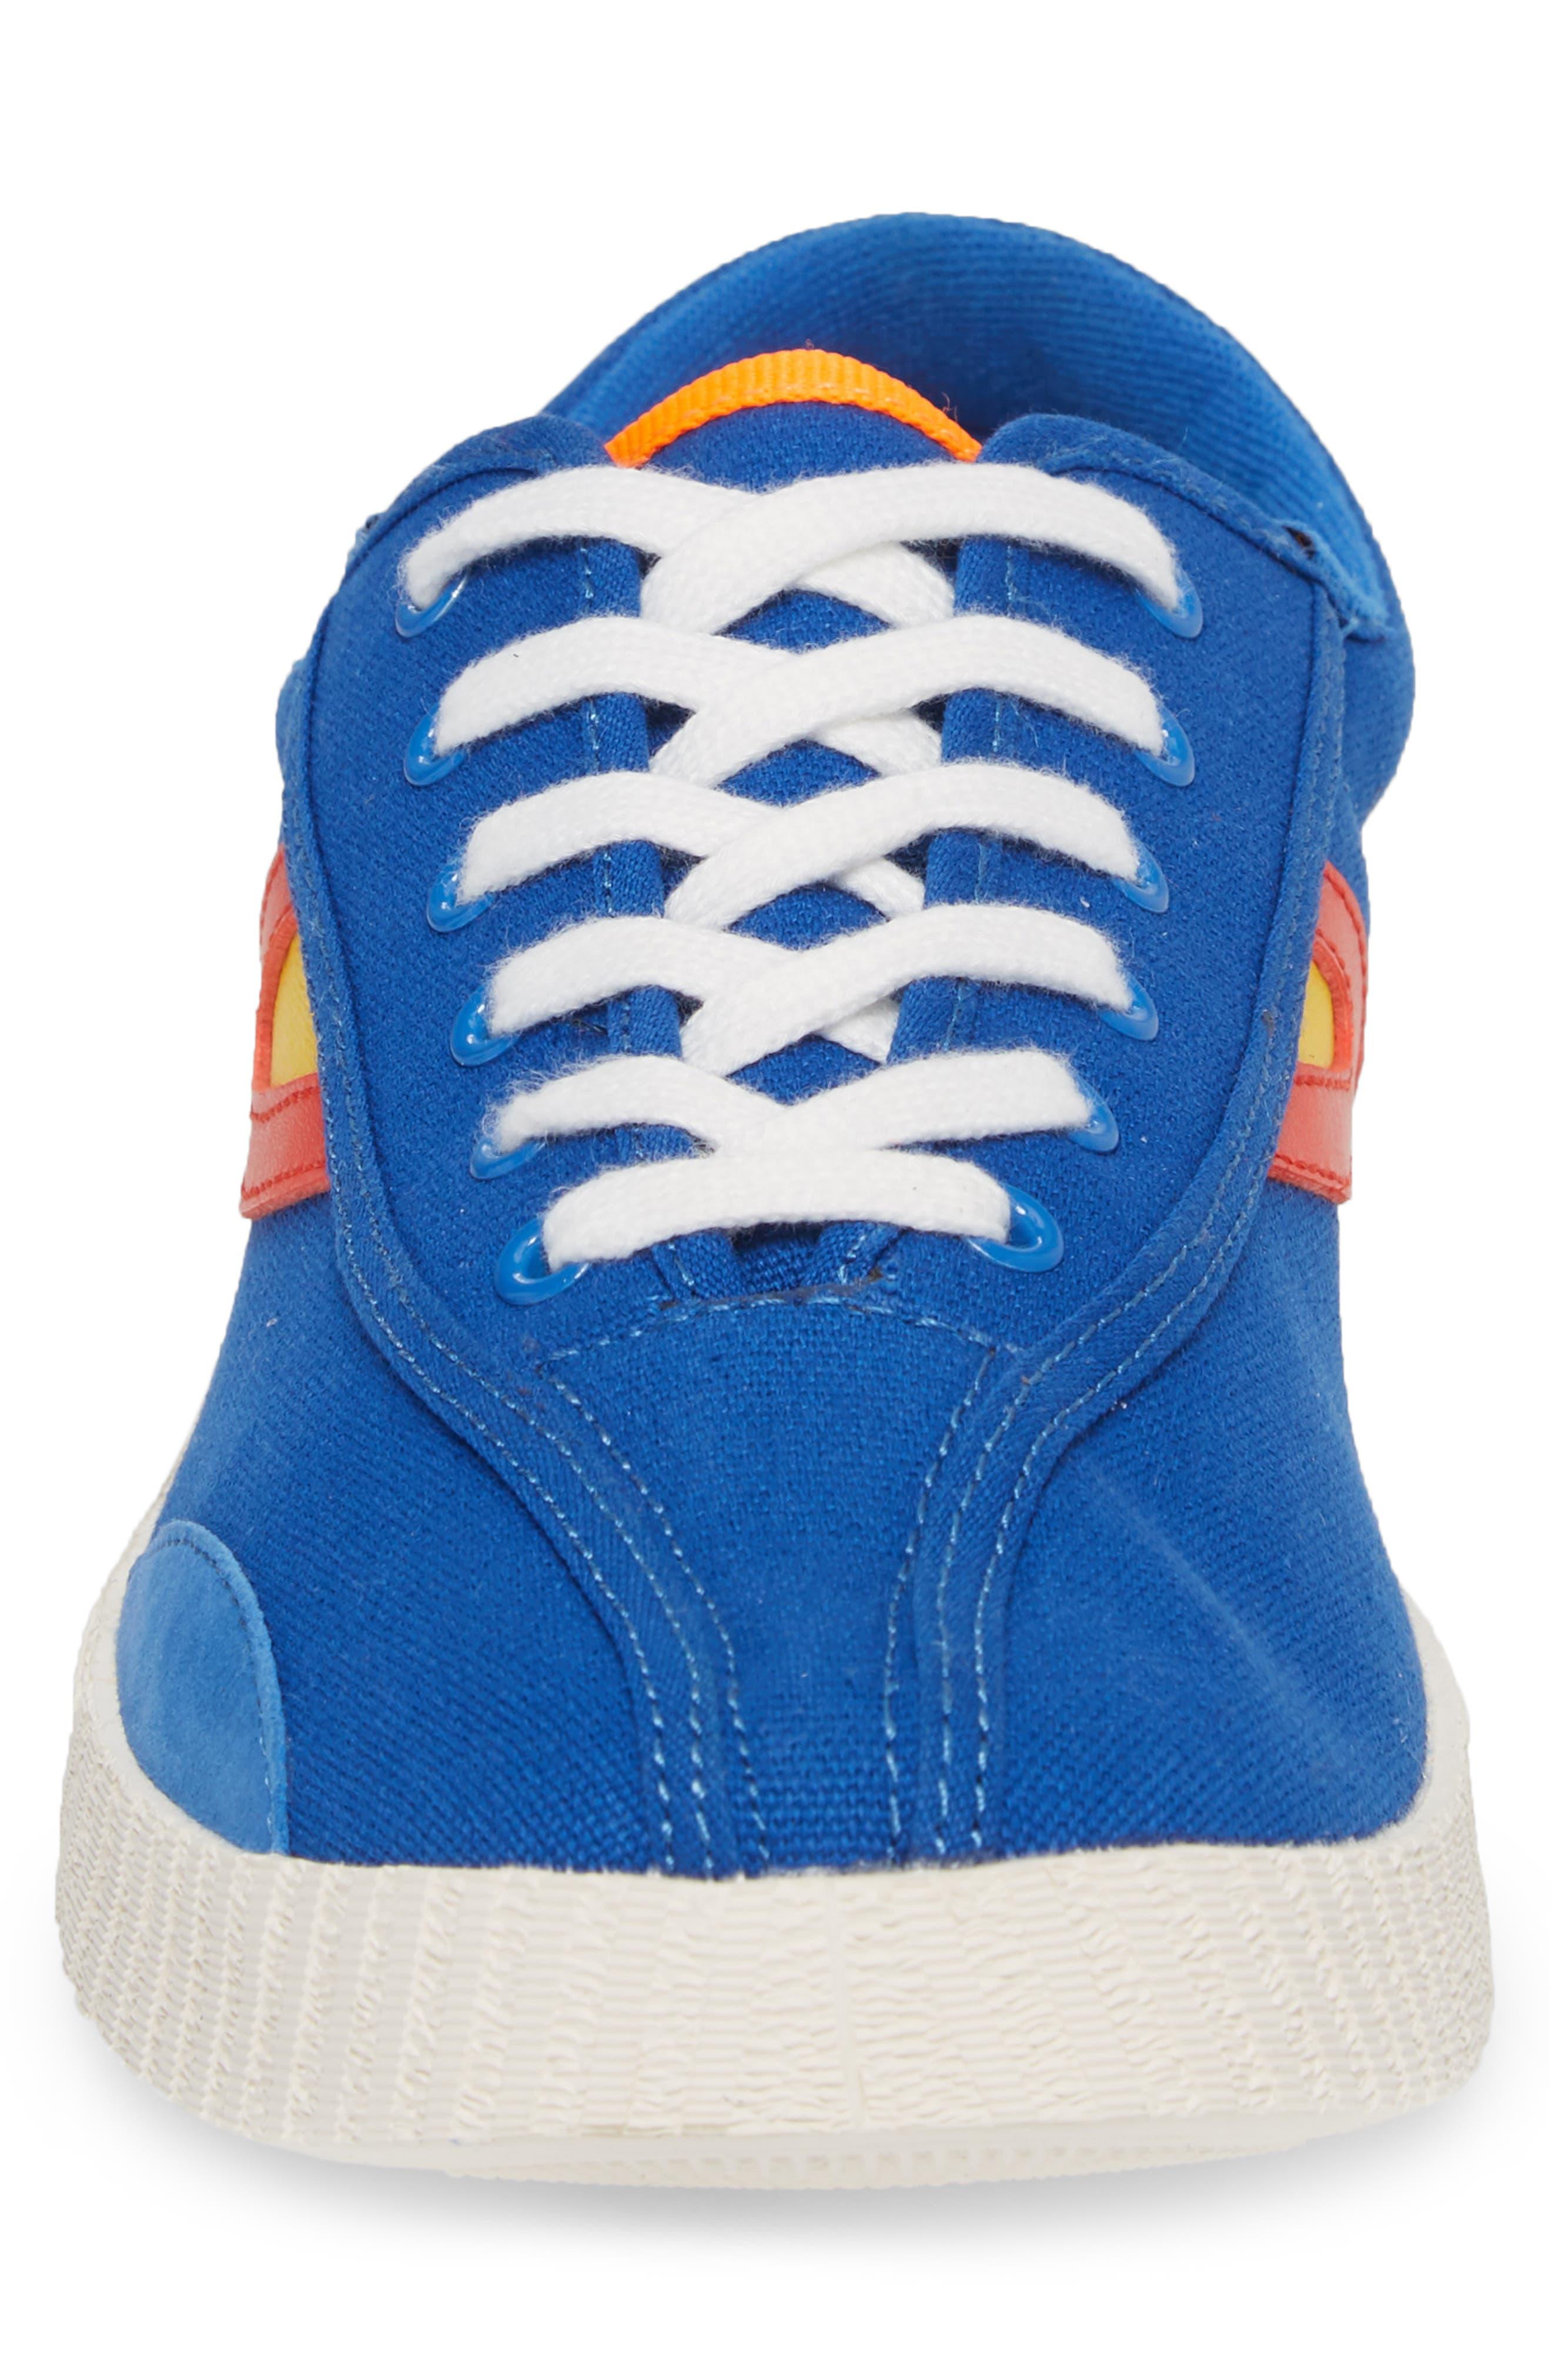 Alternate Image 4  - Tretorn Andre 3000 Nylite Low Top Sneaker (Men)